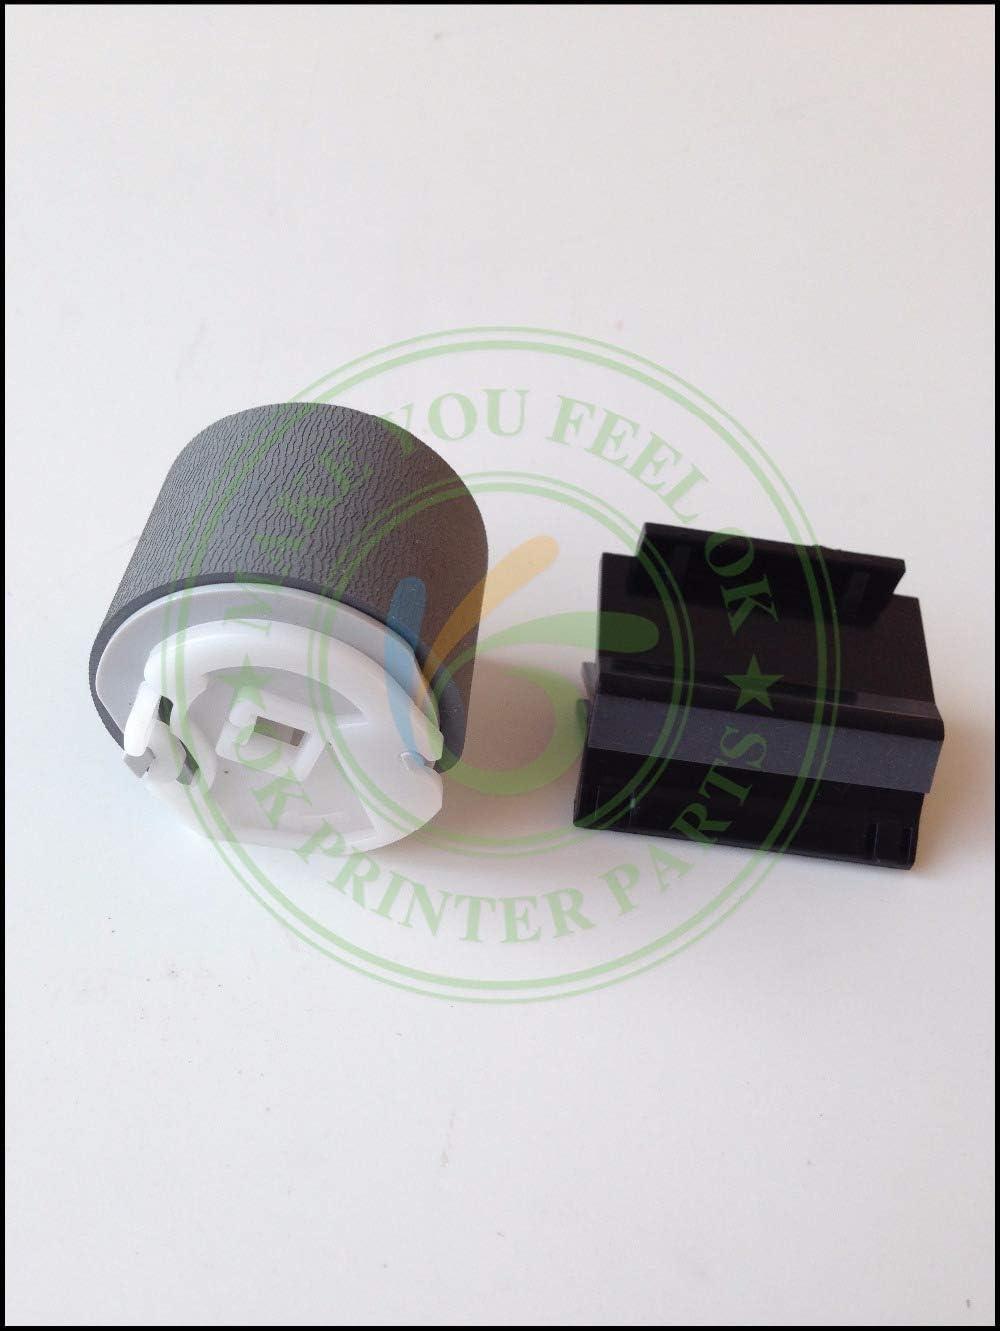 Jc73-00211A Jc97-02217A Pickup Roller Separation Pad for Samsung Ml1610 Ml1640 Ml2010 Scx4521 Scx4725 Ml2241 Clp300 Clx2160 3160 Printer Spare Parts